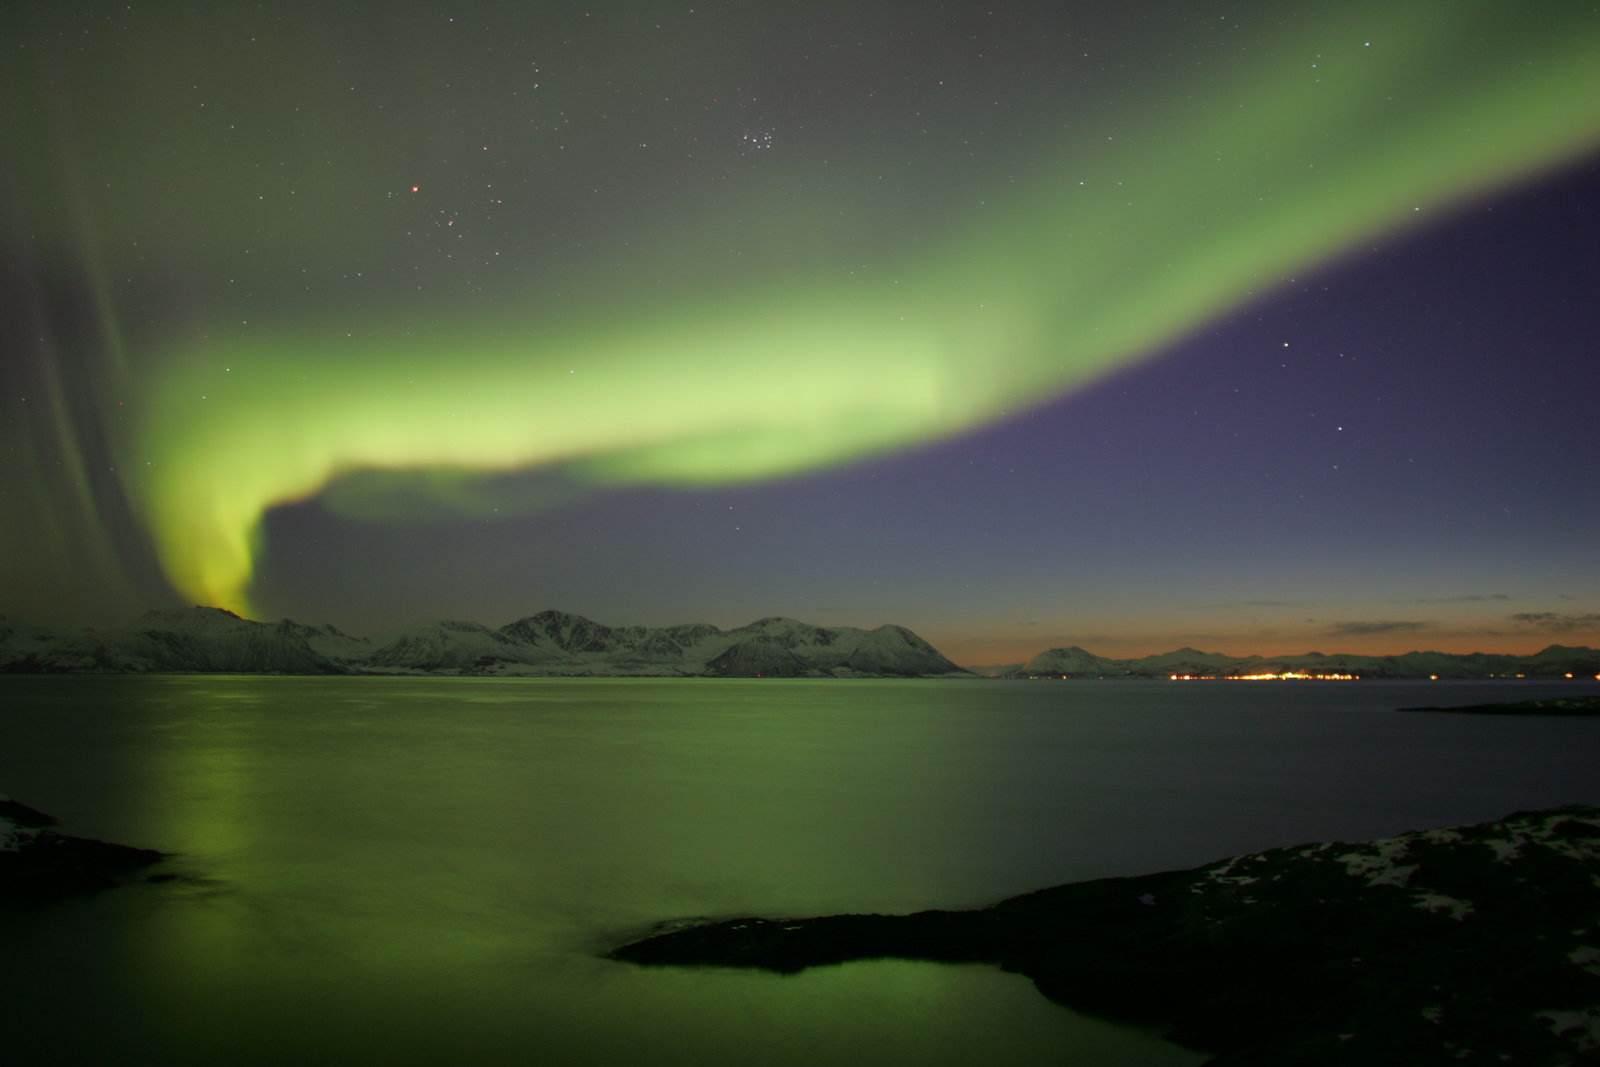 003169_Frank-Andreassen_www_nordnorge_com_Harstad.jpg